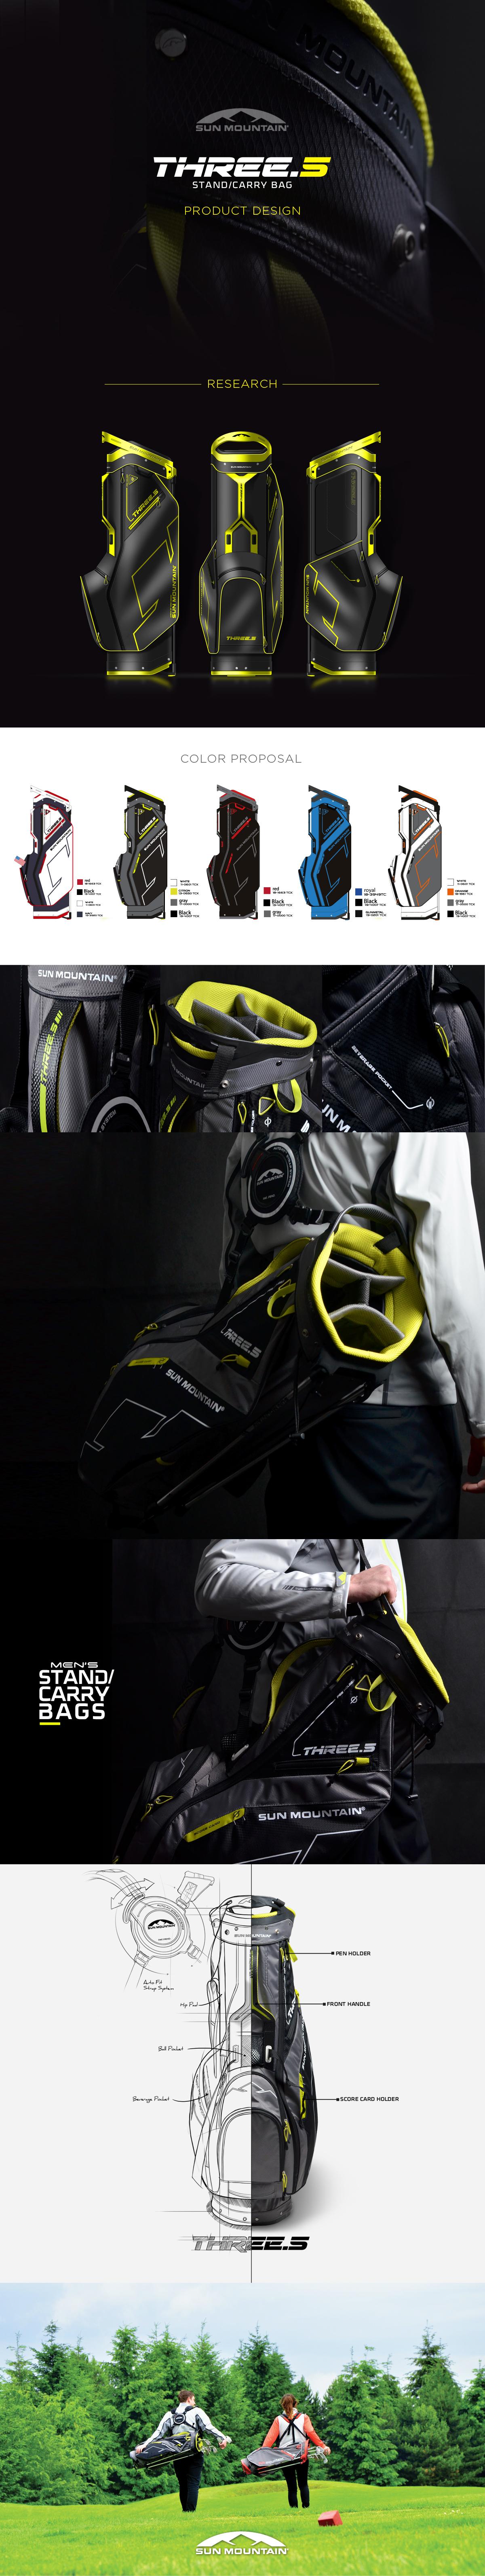 three 5 golf bag product design golf push cart. Black Bedroom Furniture Sets. Home Design Ideas